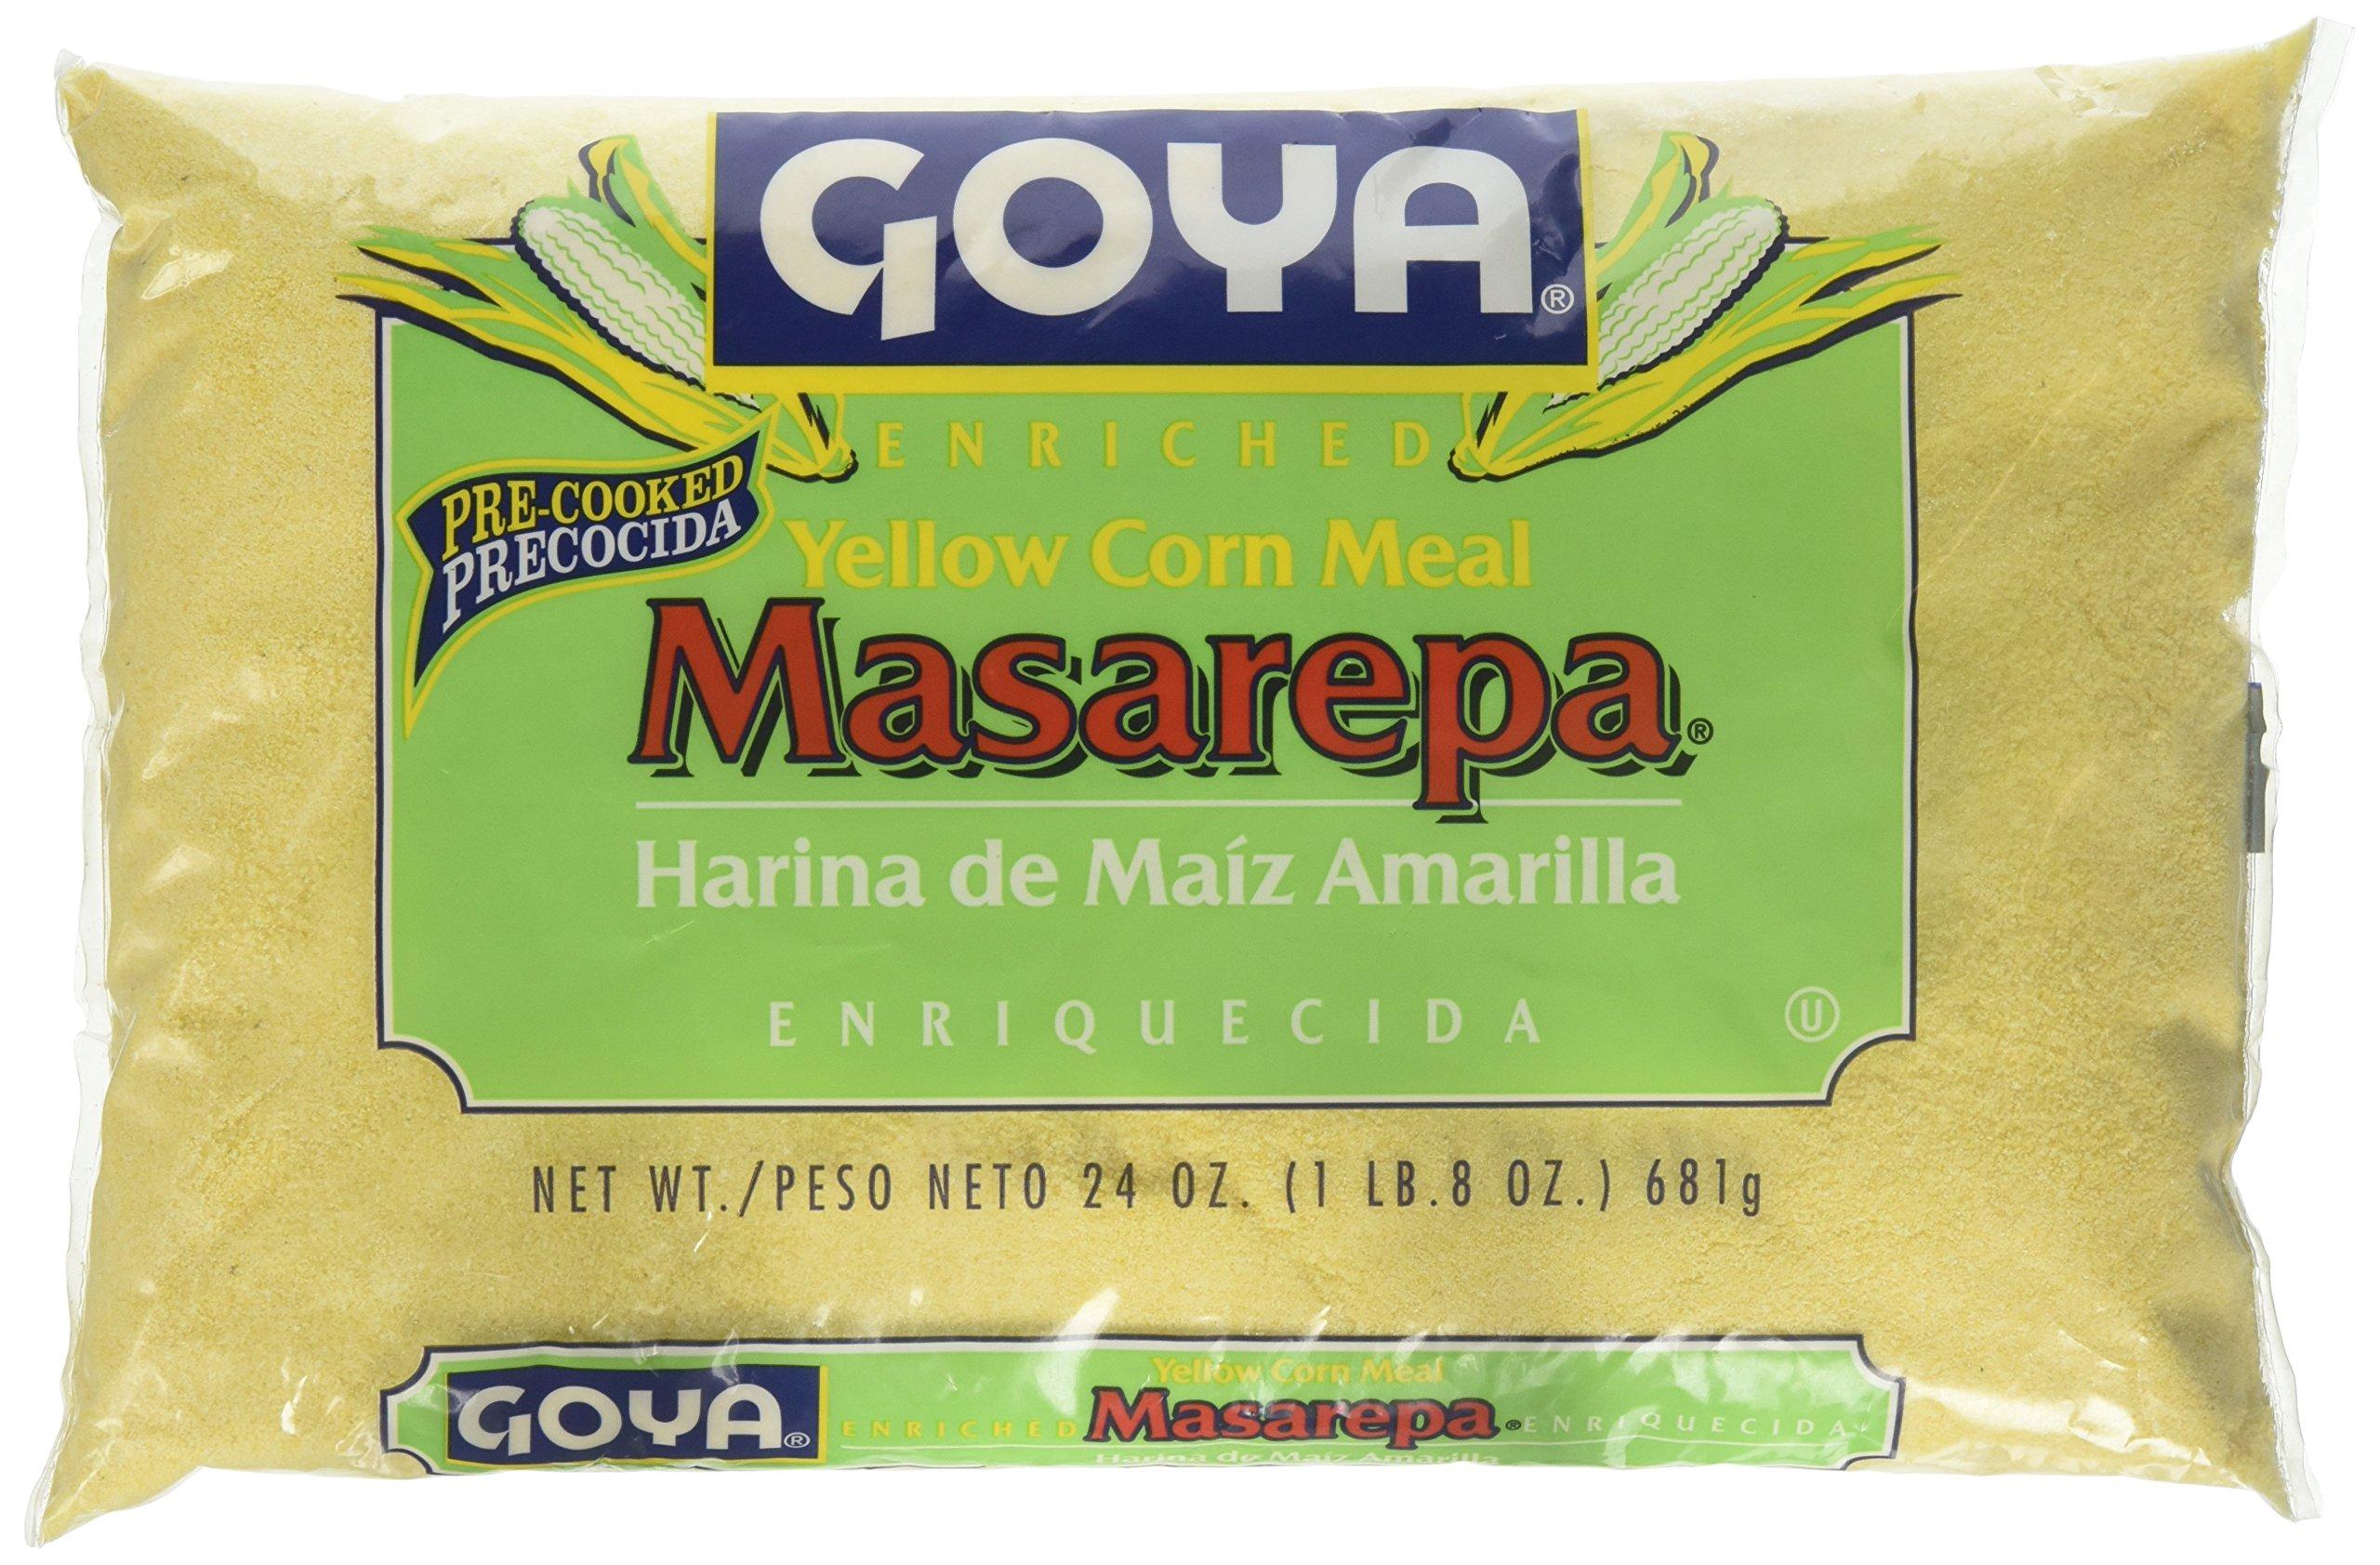 Goya Masarepa Yellow Corn Meal 24 oz